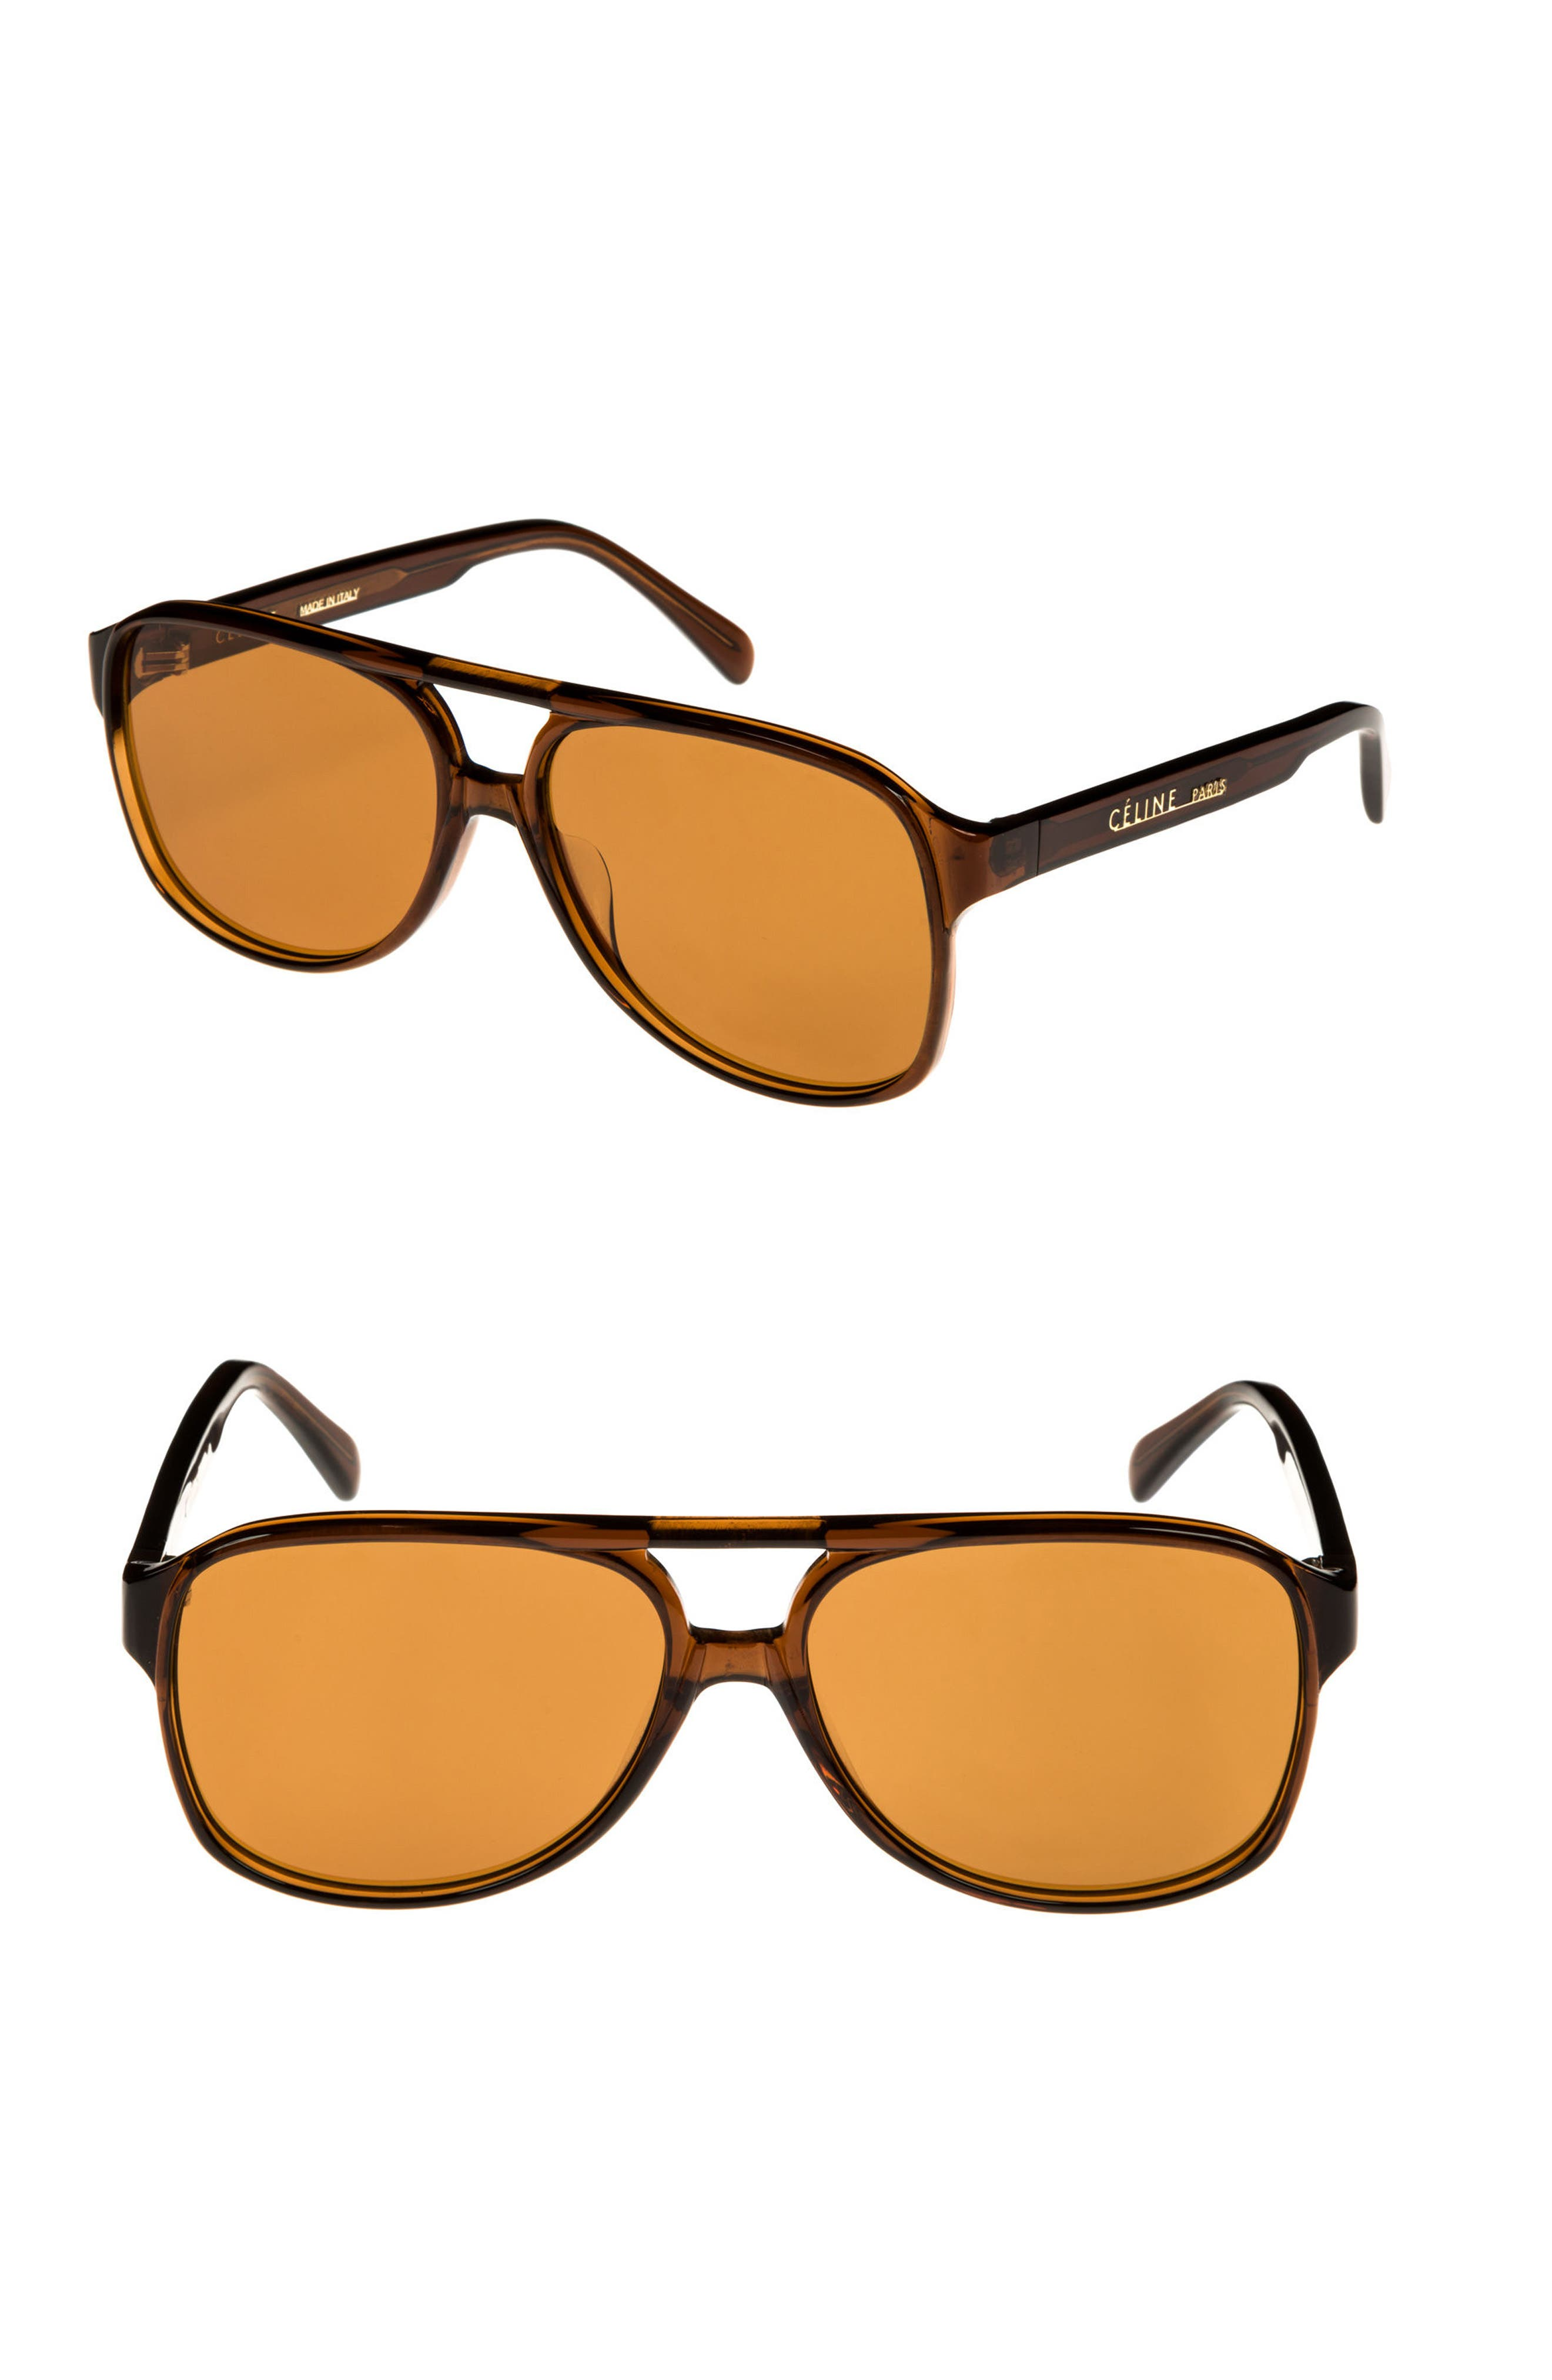 Main Image - Céline 62mm Oversize Aviator Sunglasses